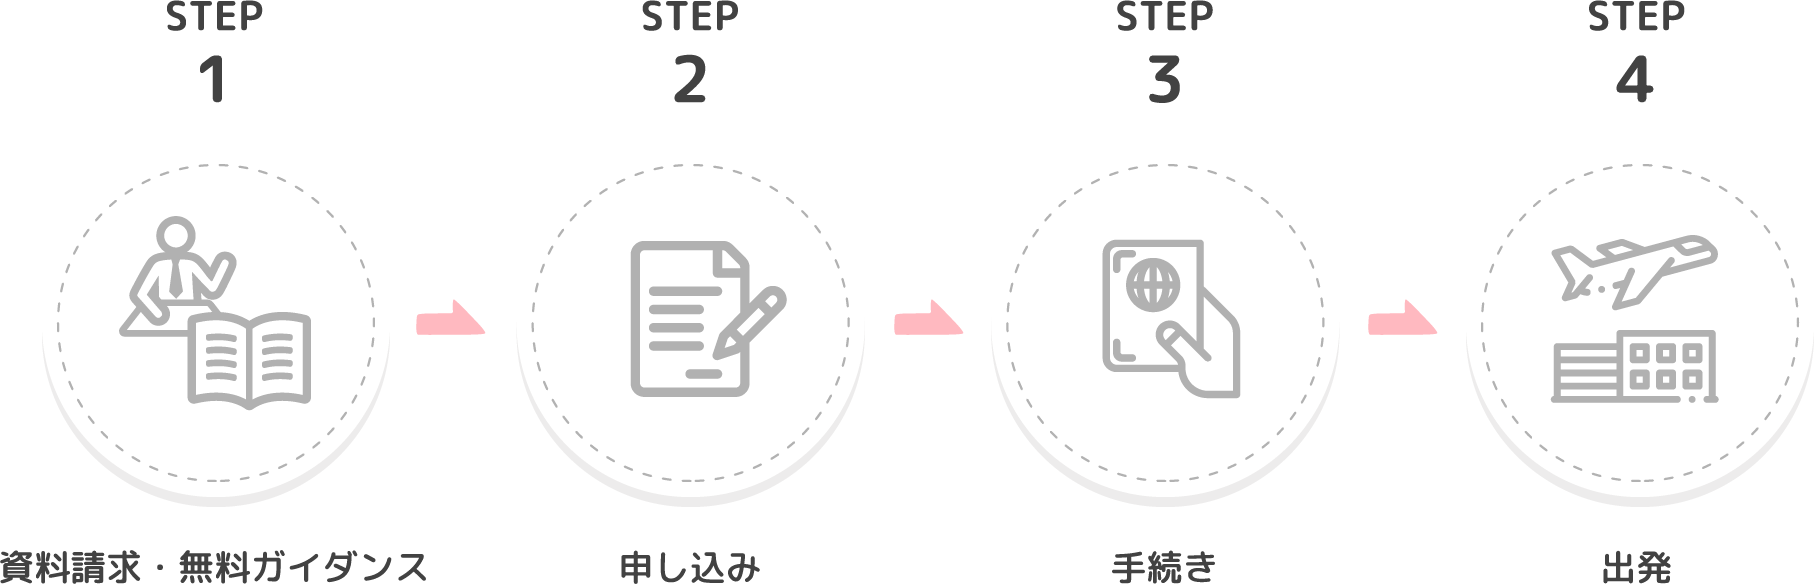 STEP1 資料請求・無料ガイダンス STEP2 申し込み STEP3 ⼿続き STEP4 出発